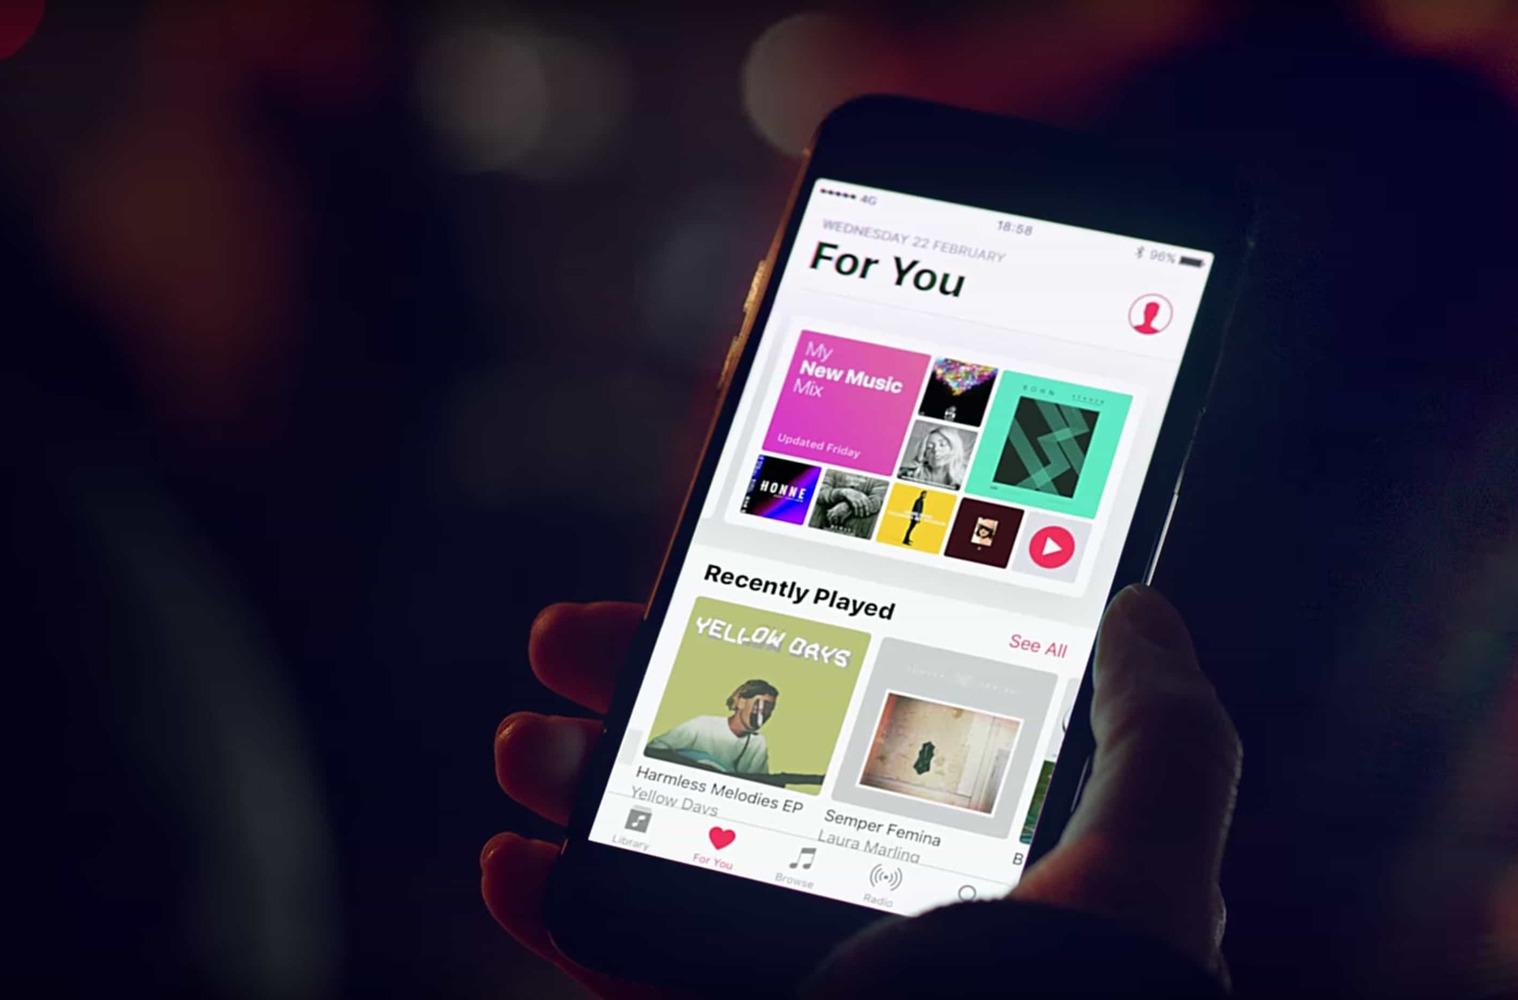 Перенос музыки из ВКонтакте в Apple Music